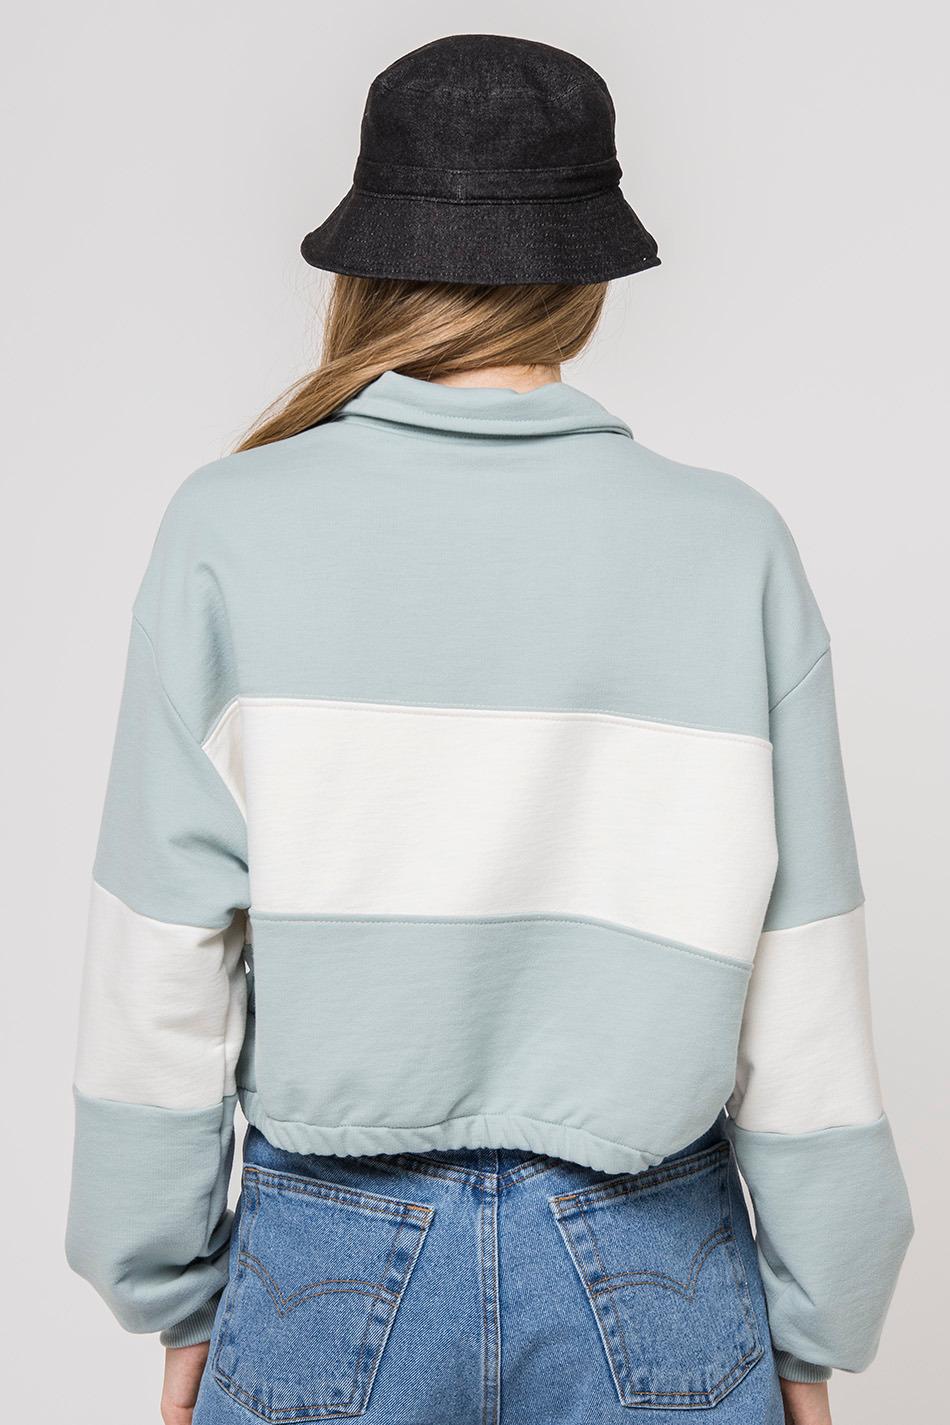 Gaynor Ivory/Cloud Sweatshirt